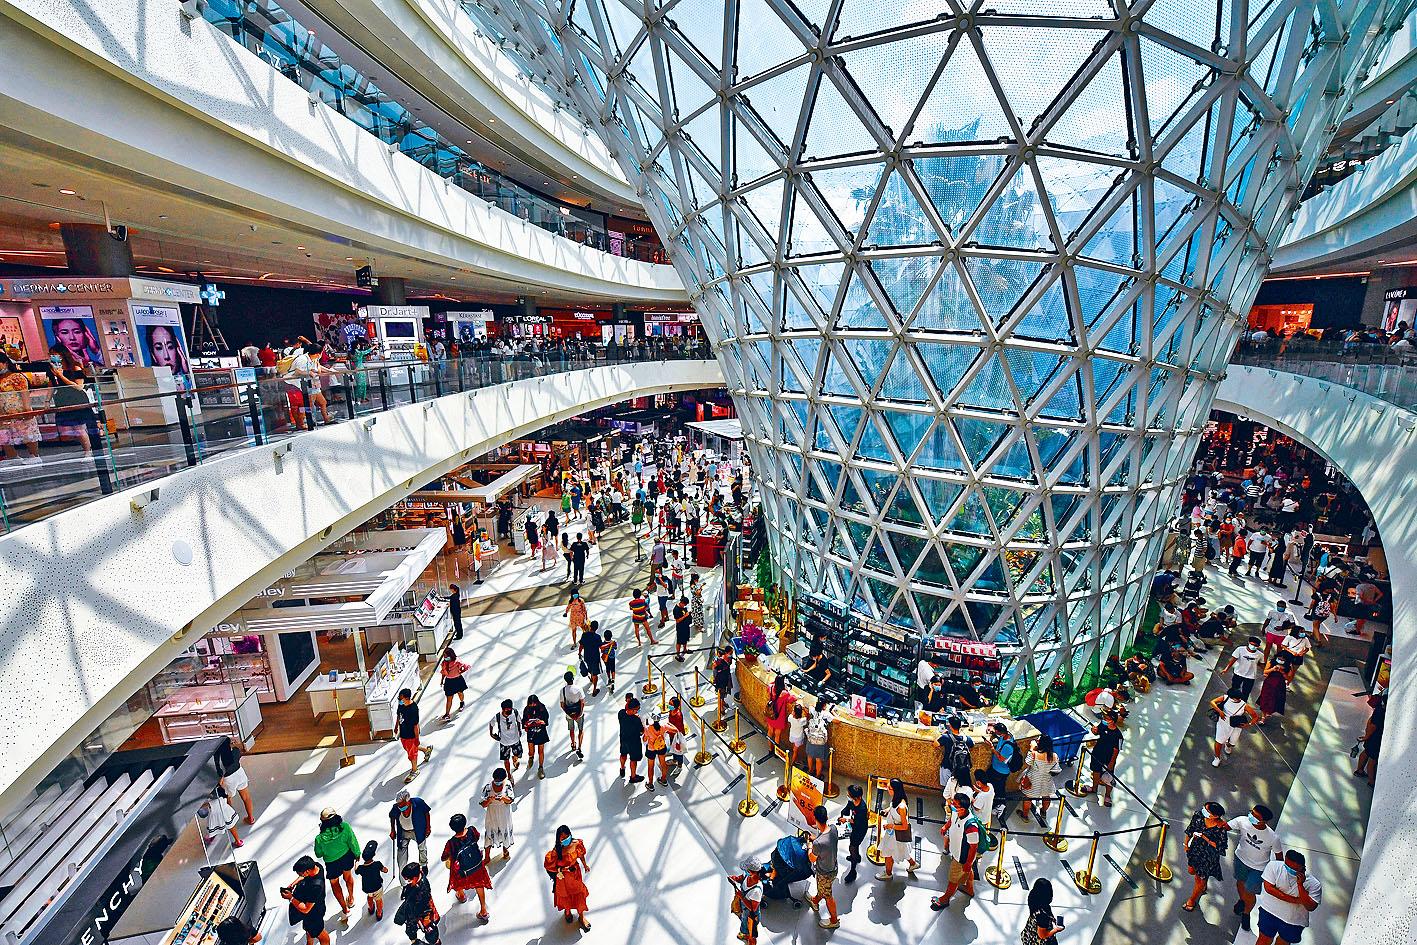 Hainan become duty-free haven. Credit: Stheadline